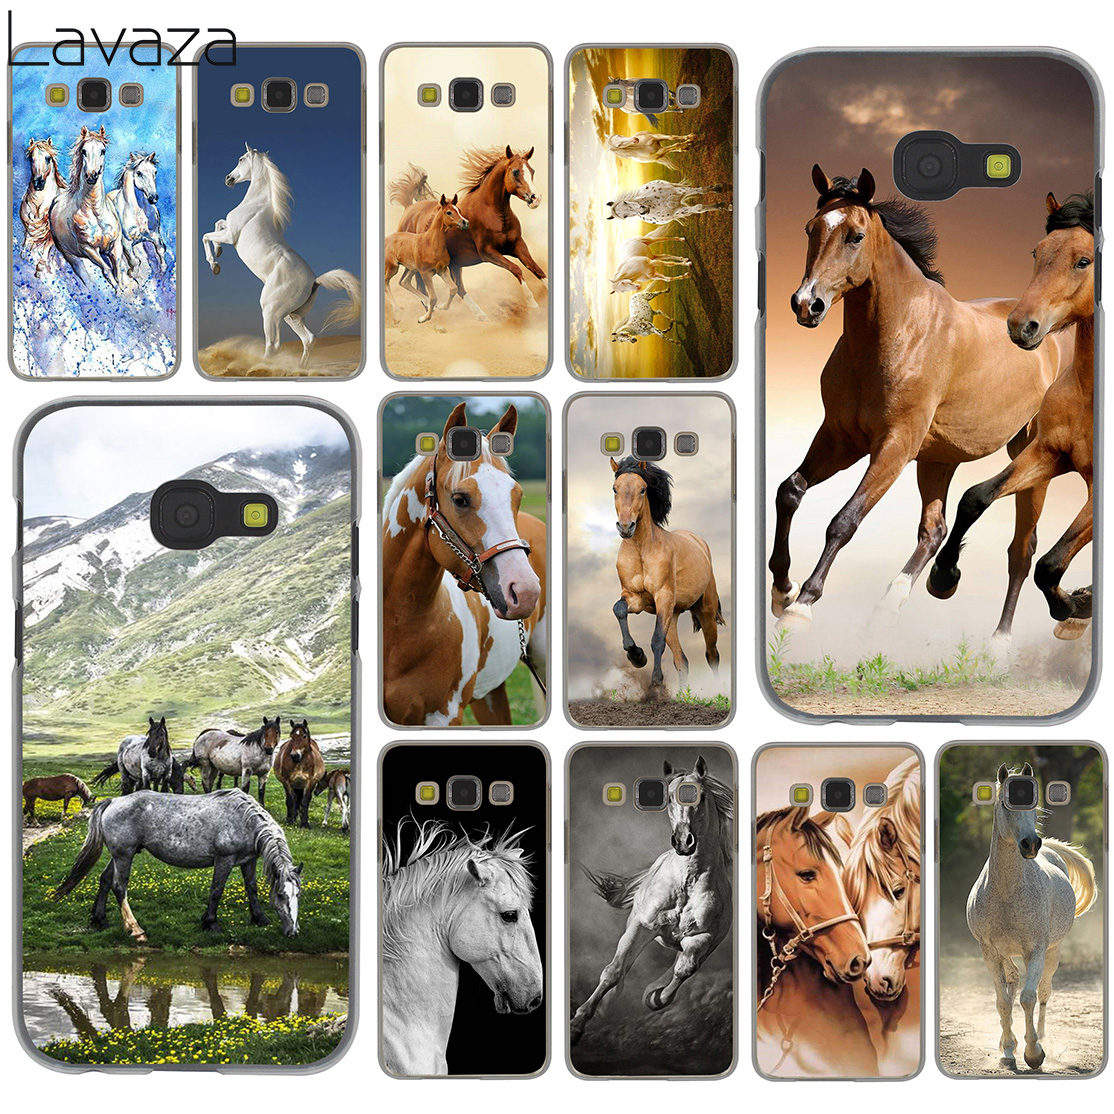 Lavaza – coque rigide pour Samsung Galaxy Note 10, 9, 8, A9, A8, A7, A6 Plus 2018, A5, A3, 2015, 2016, 2017, A2